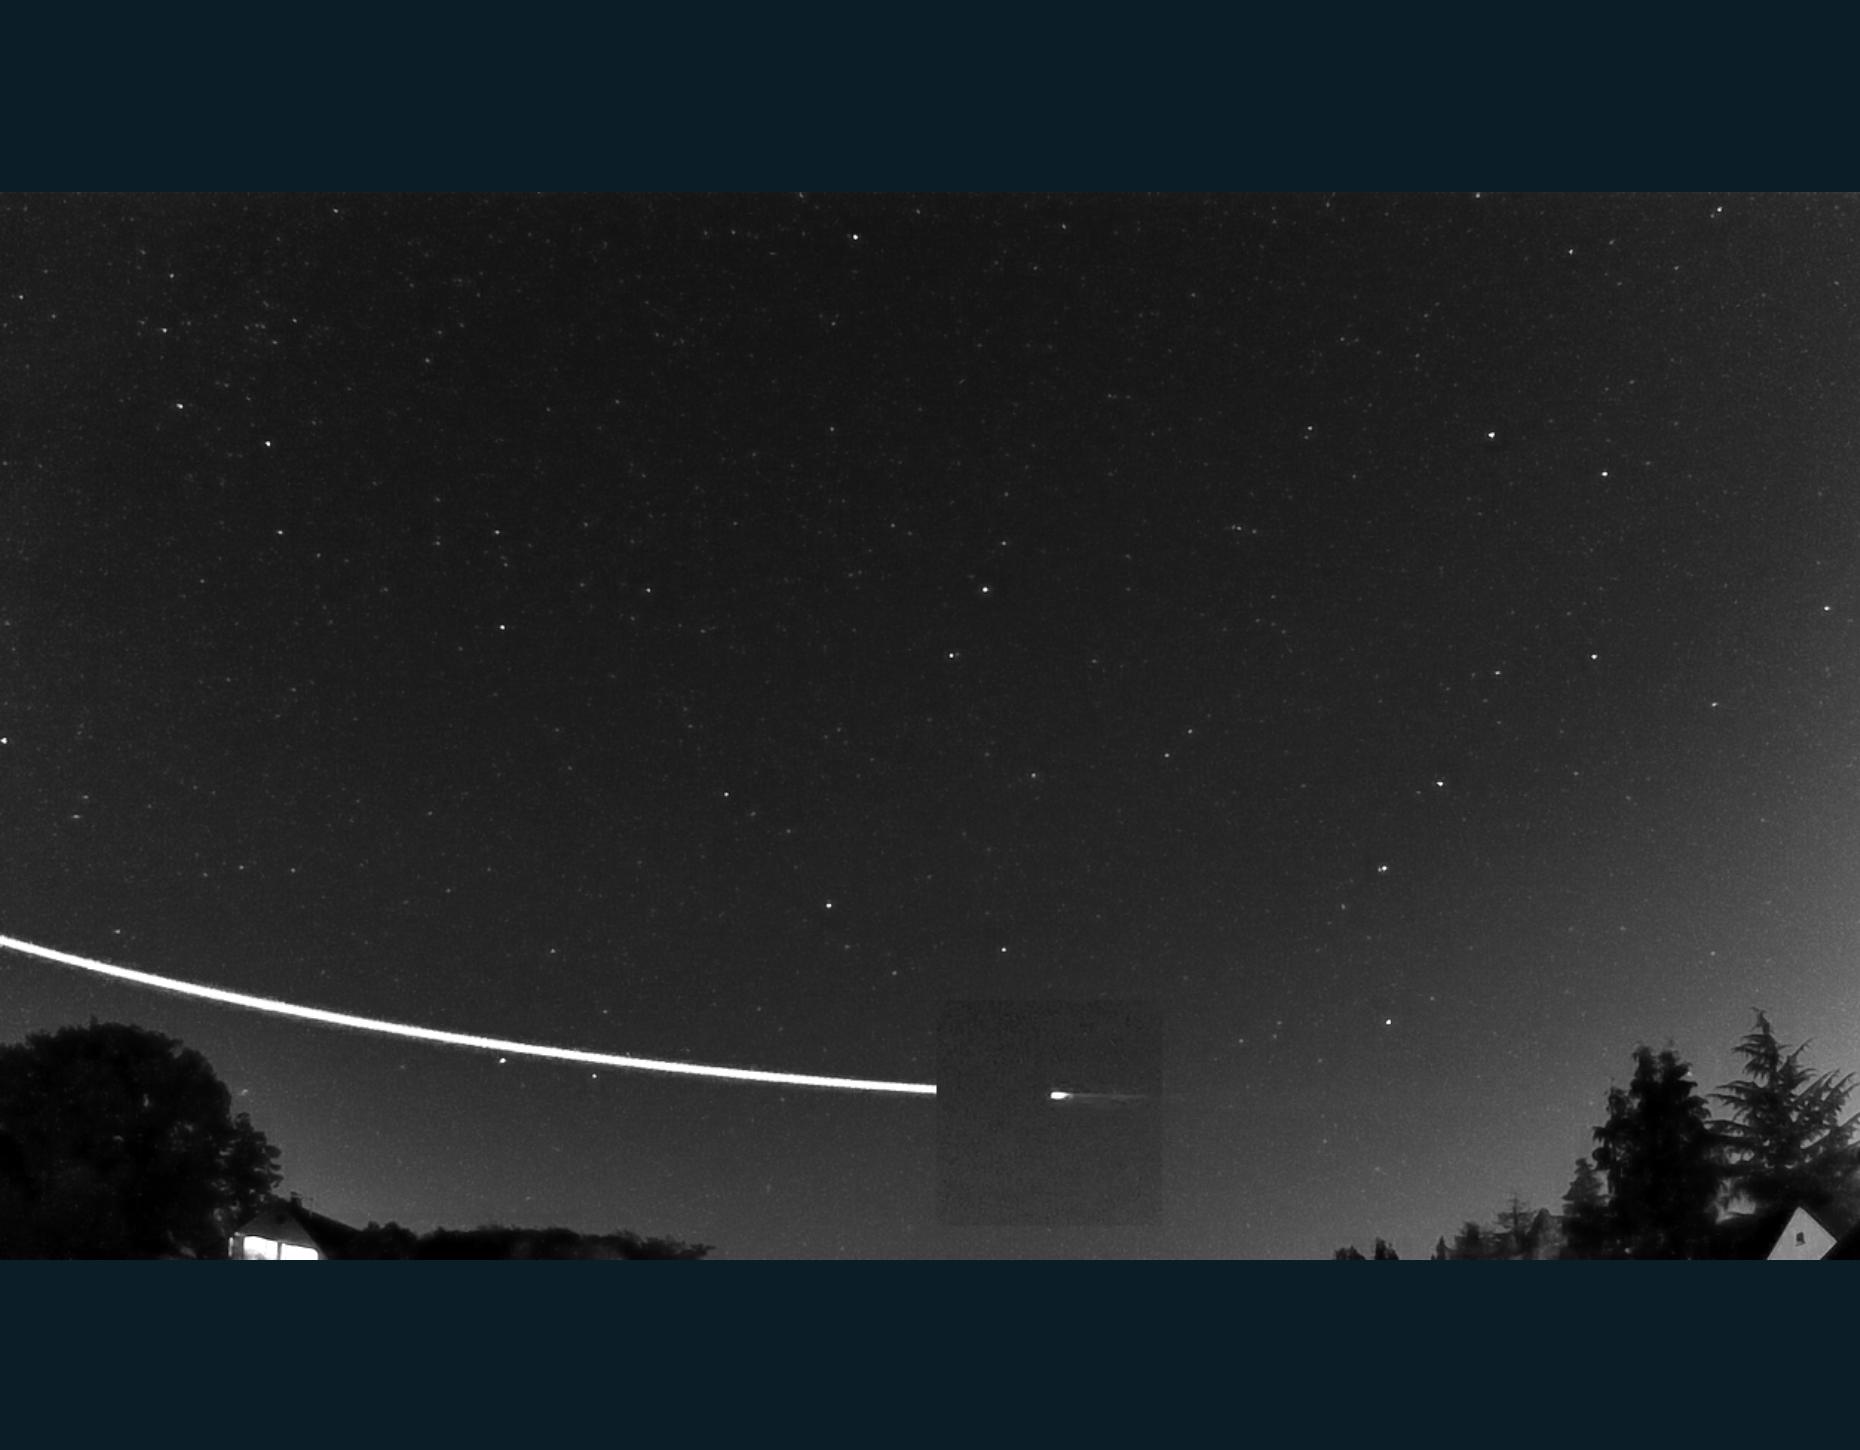 The earthgrazer streaked across the sky above Germany (ESA)